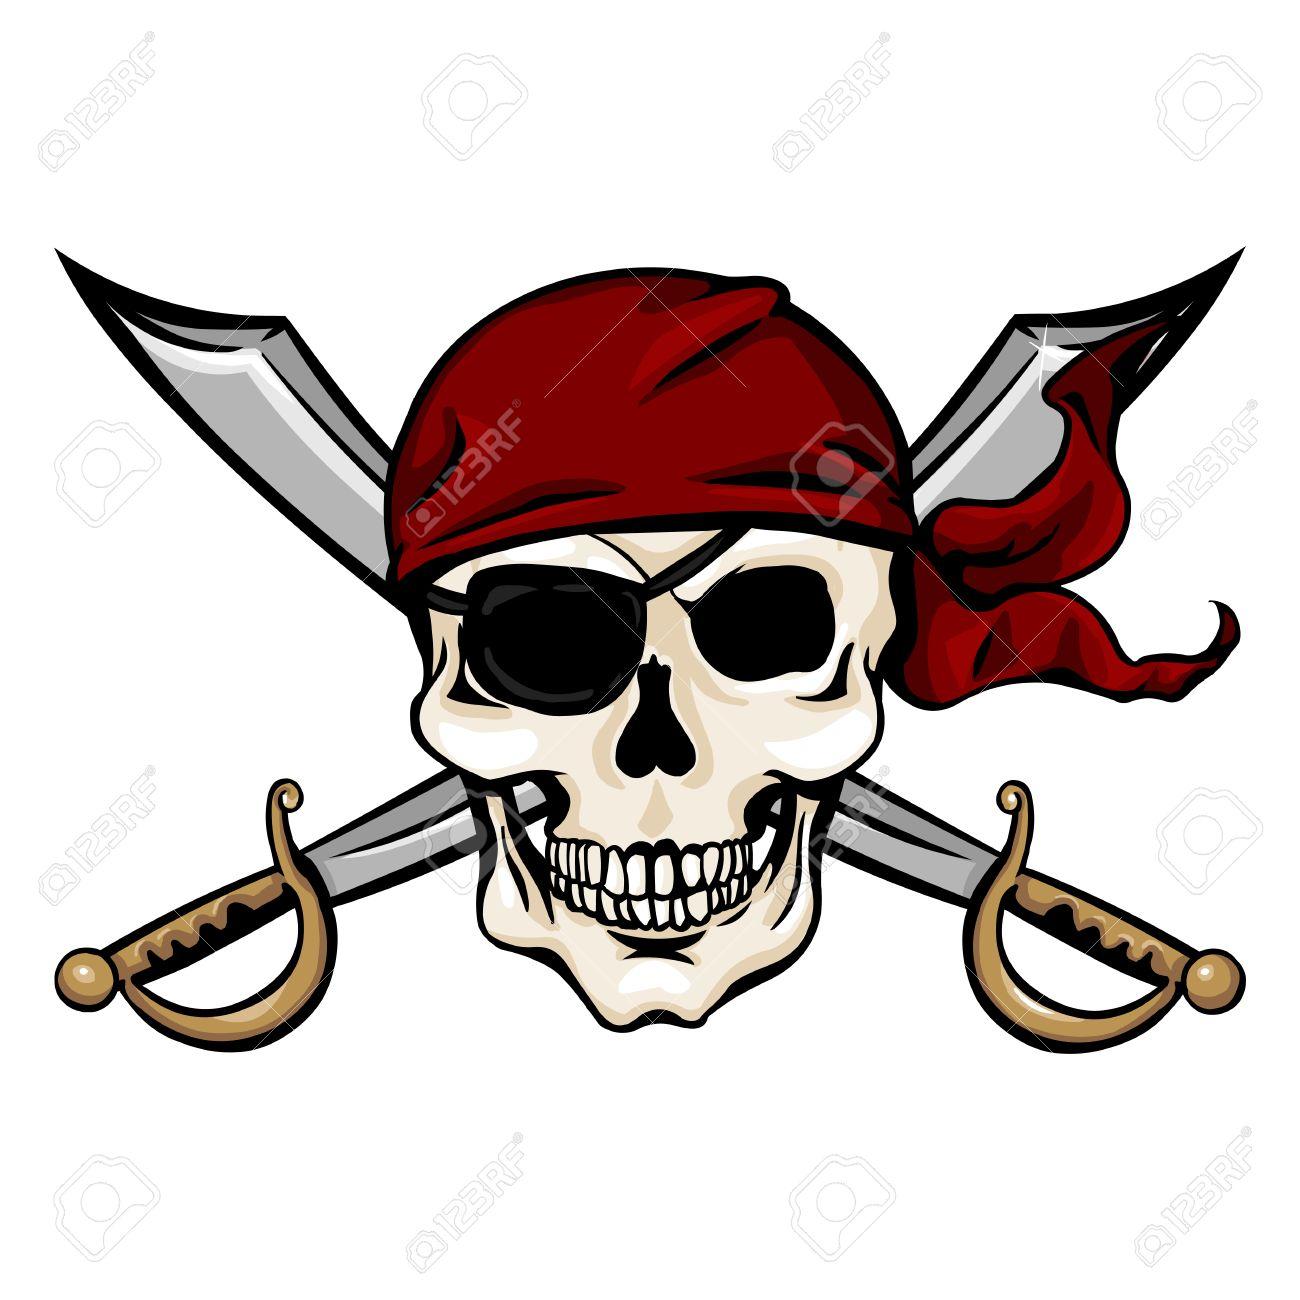 1300x1300 Vector Single Cartoon Pirate Skull In Red Bandana With Cross